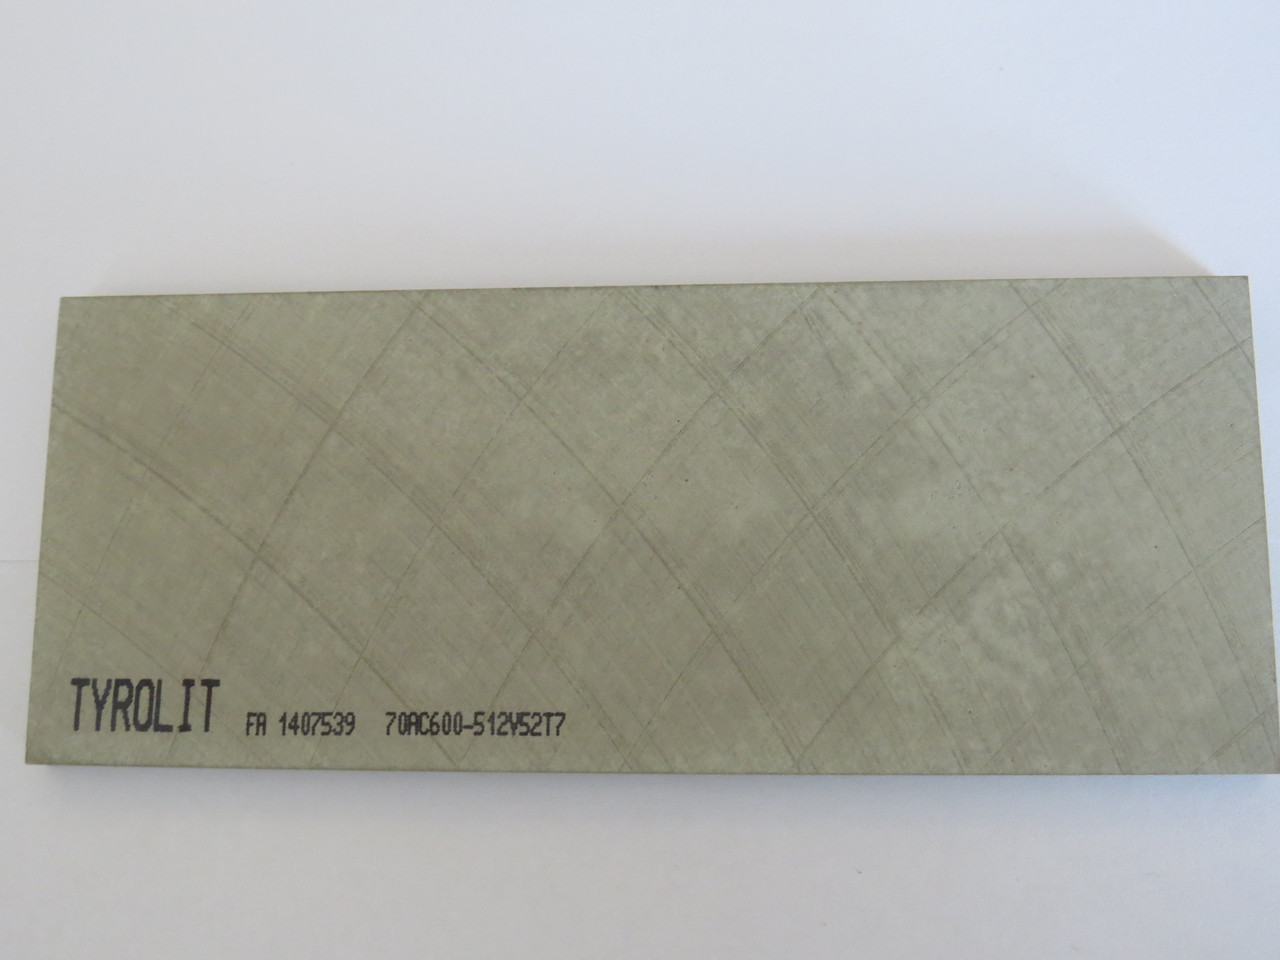 Абразивный доводочный брусок 60х6х150 TYROLIT